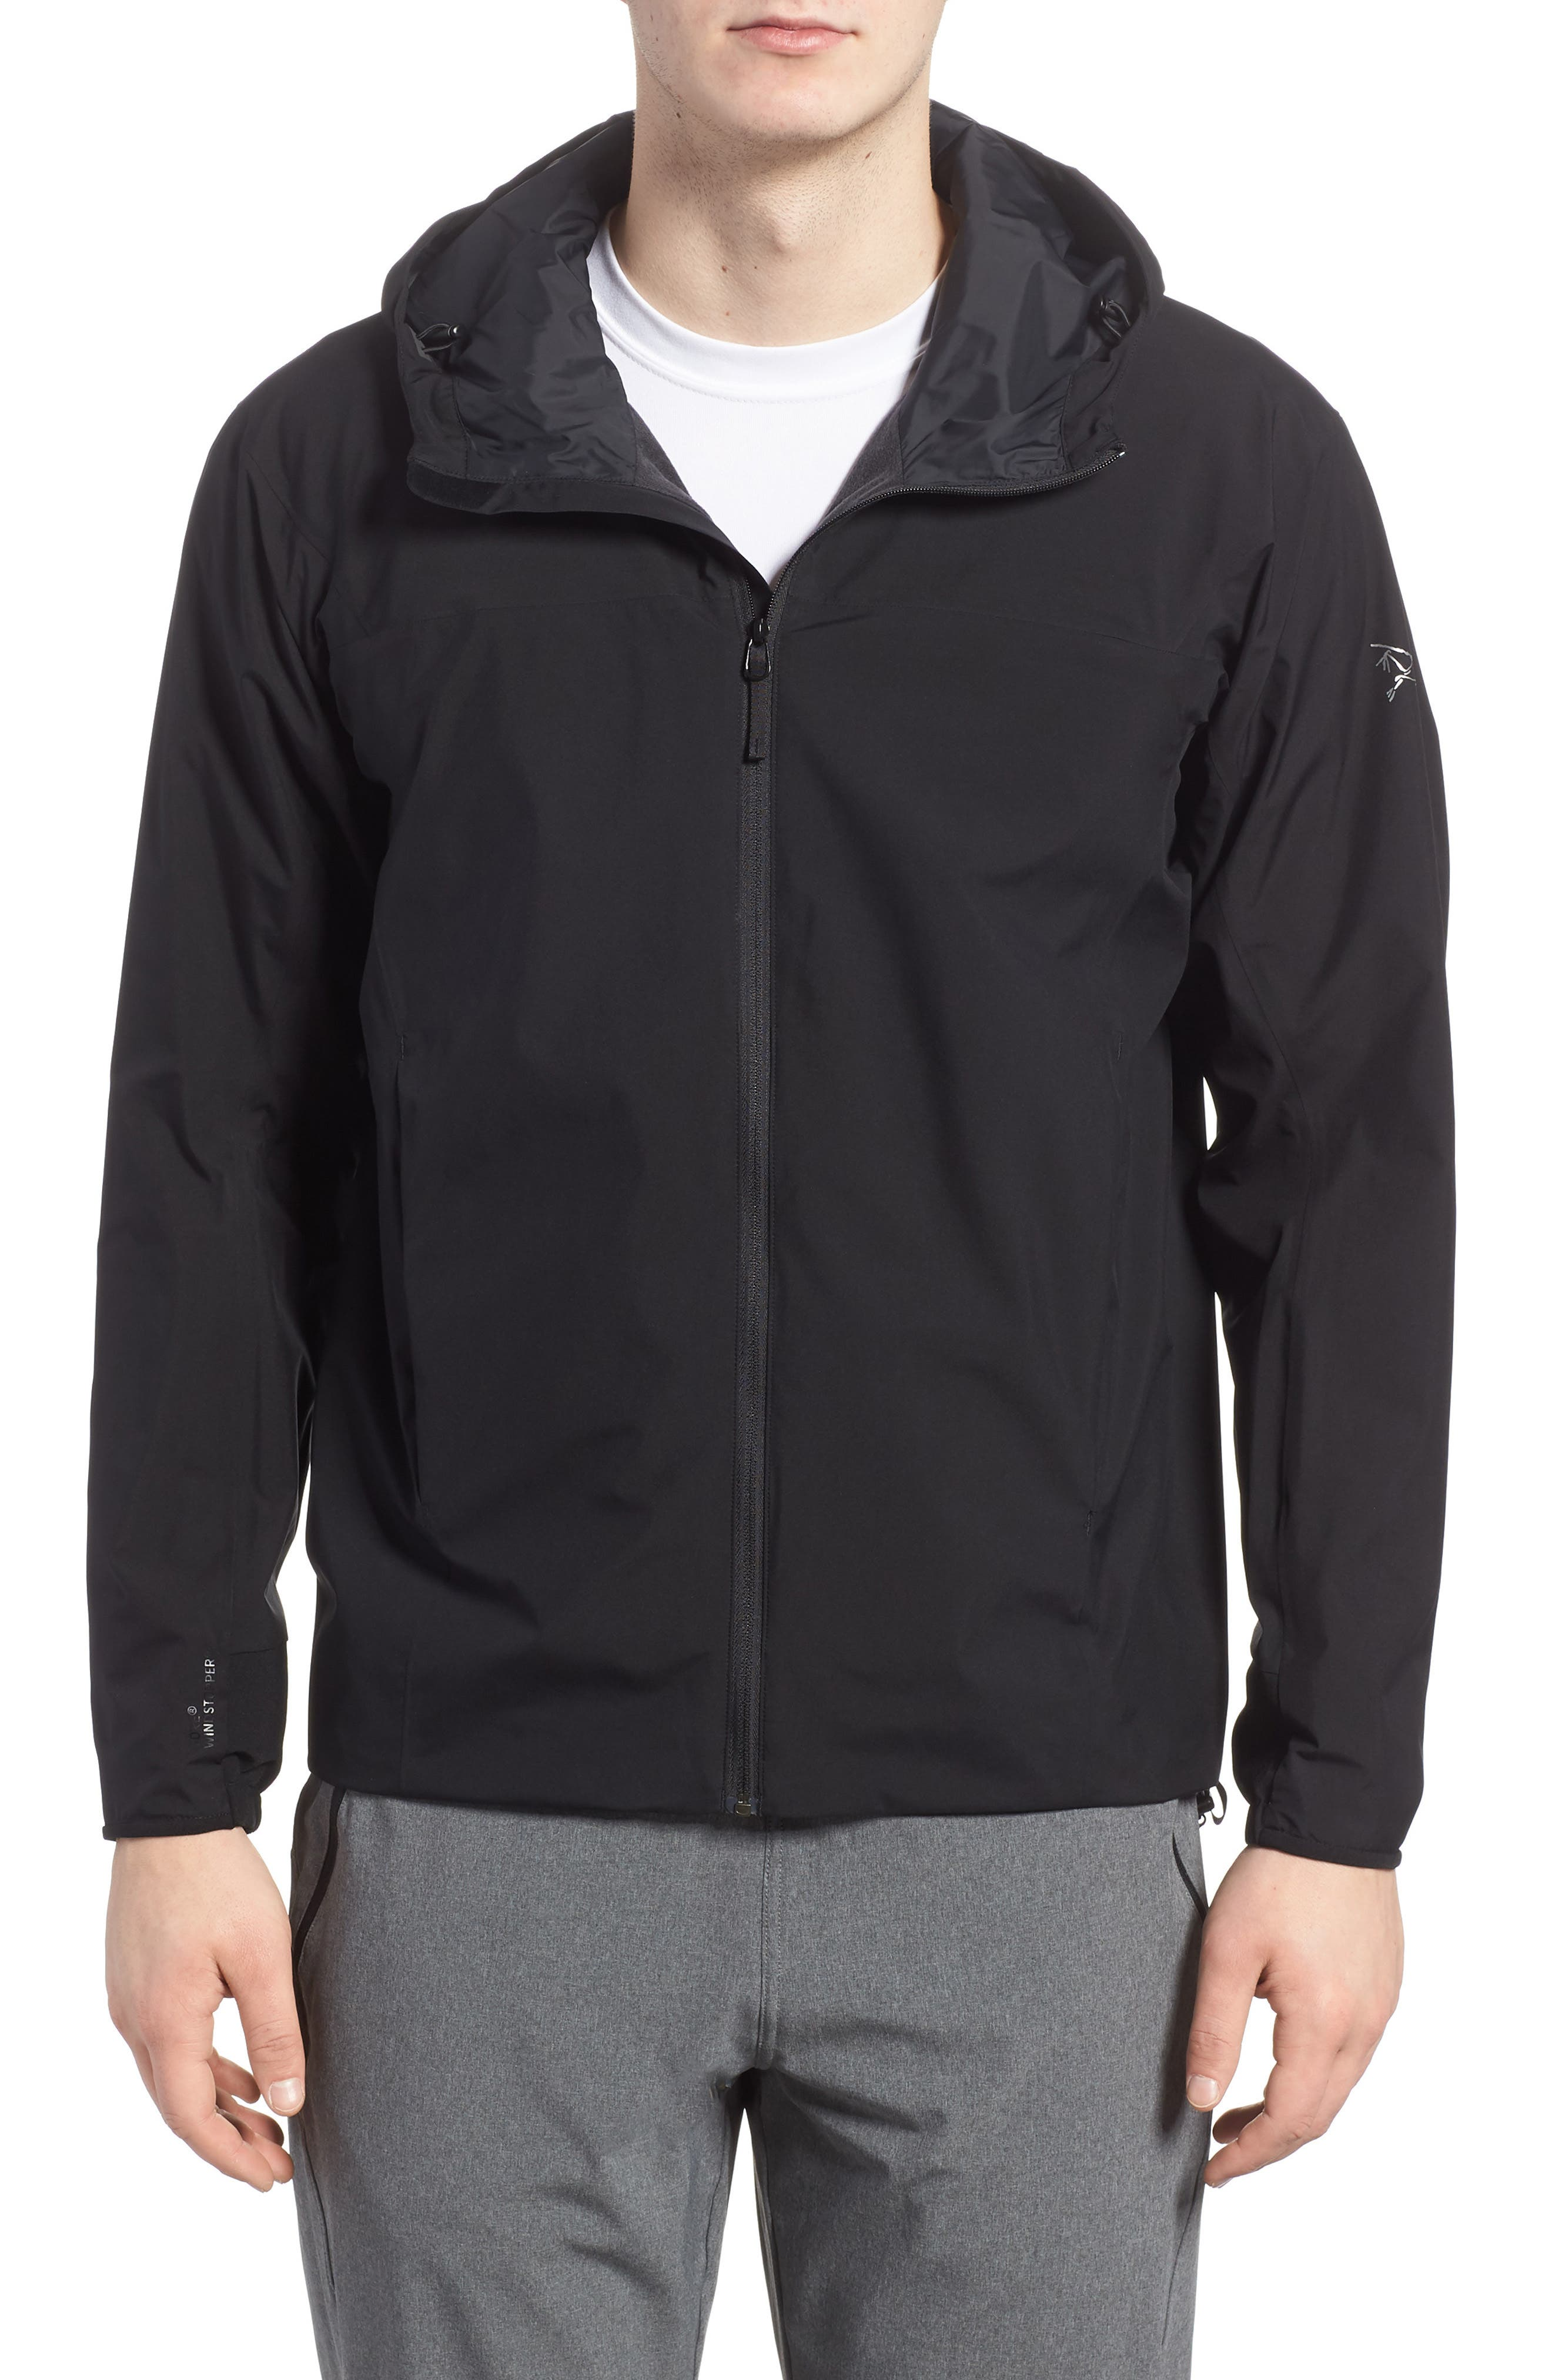 Arc'teryx Solano Windstopper® Trim Fit Water Resistant Jacket